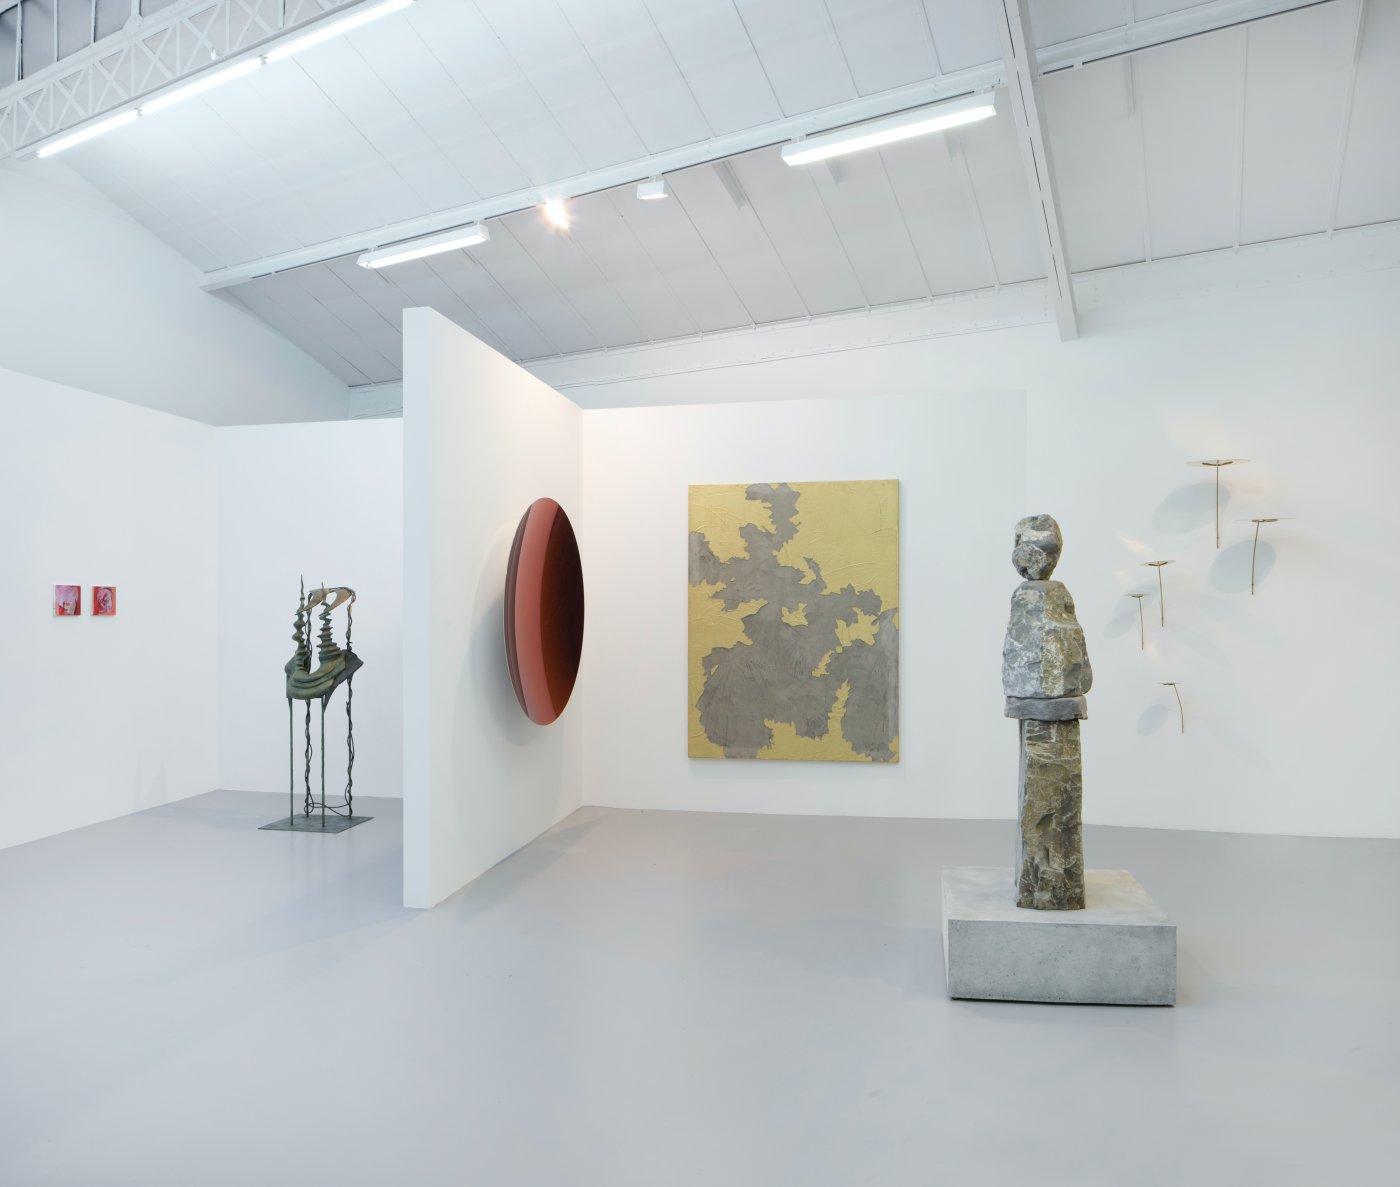 kamel mennour FIAC in the galleries 4